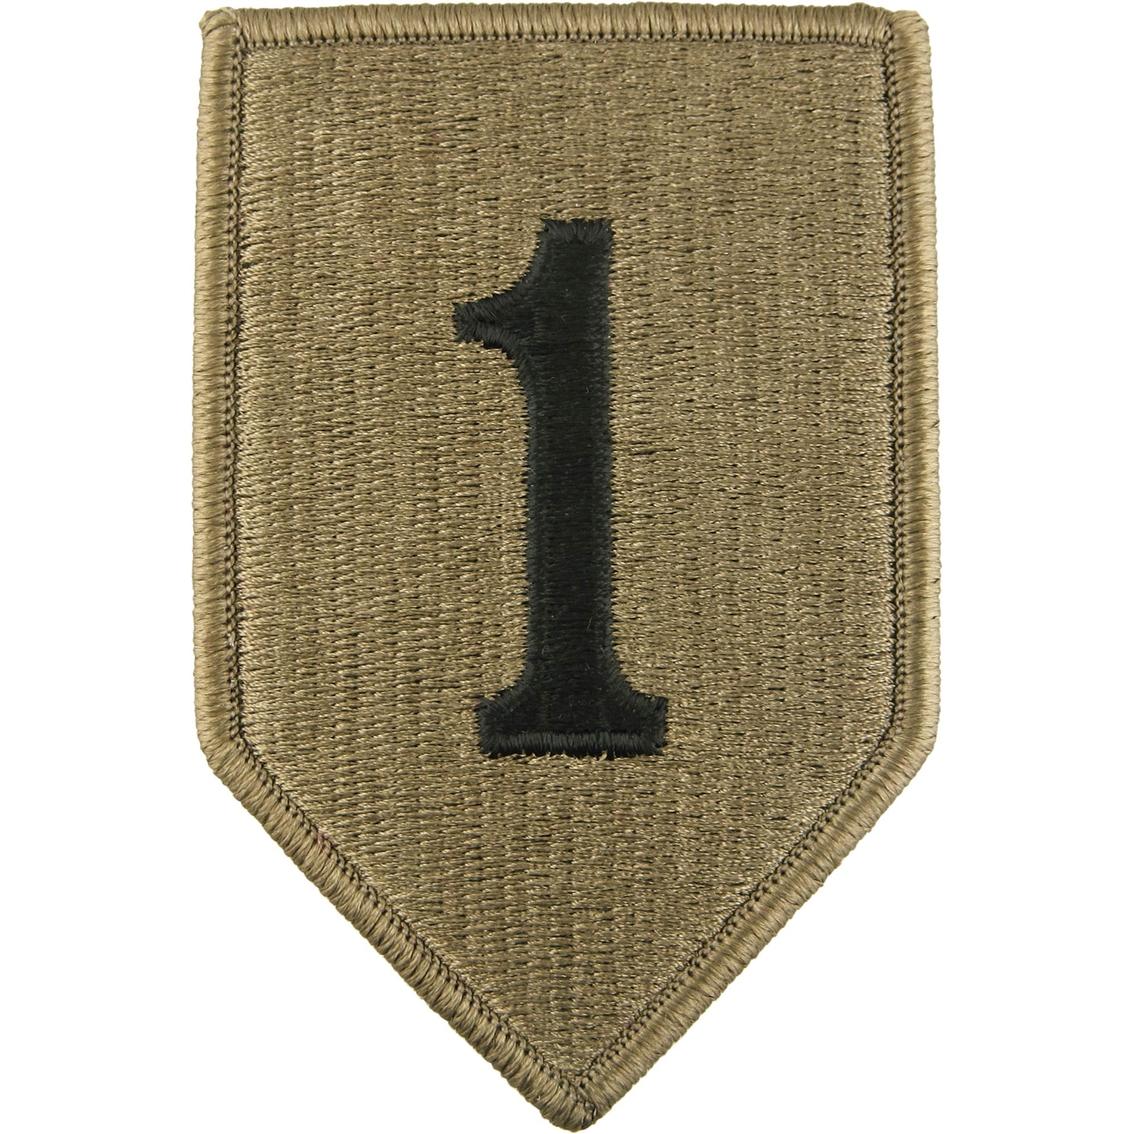 Army Unit Patch 1st Infantry Division (ocp)   Ocp Unit